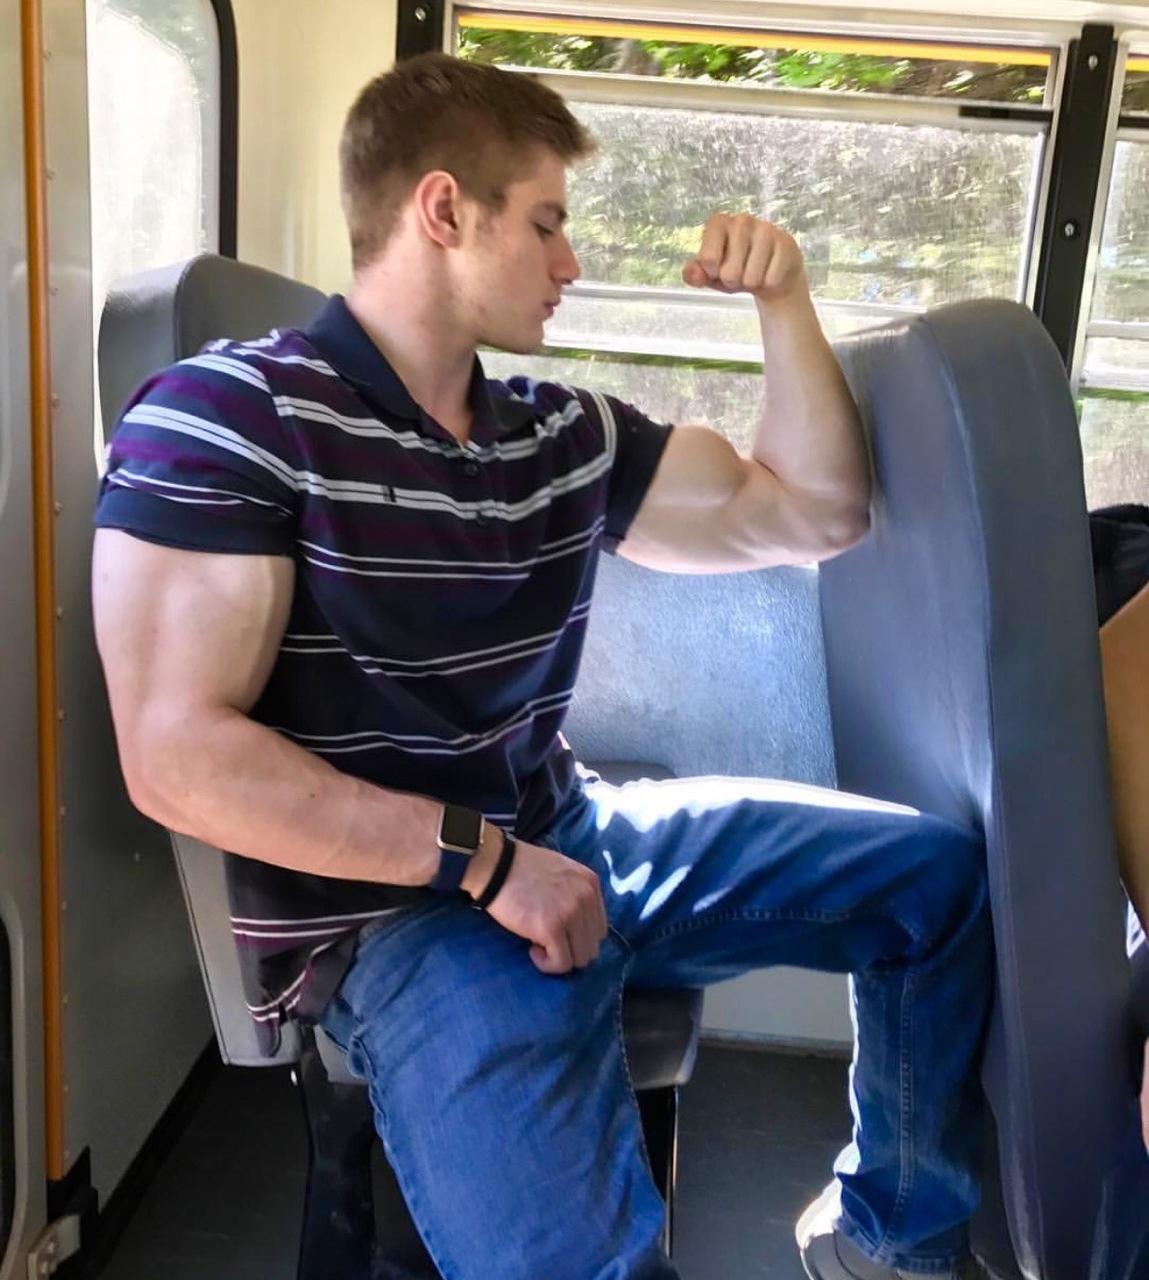 bad-boys-school-bus-huge-muscle-biceps-flexing-bro-sexy-dude